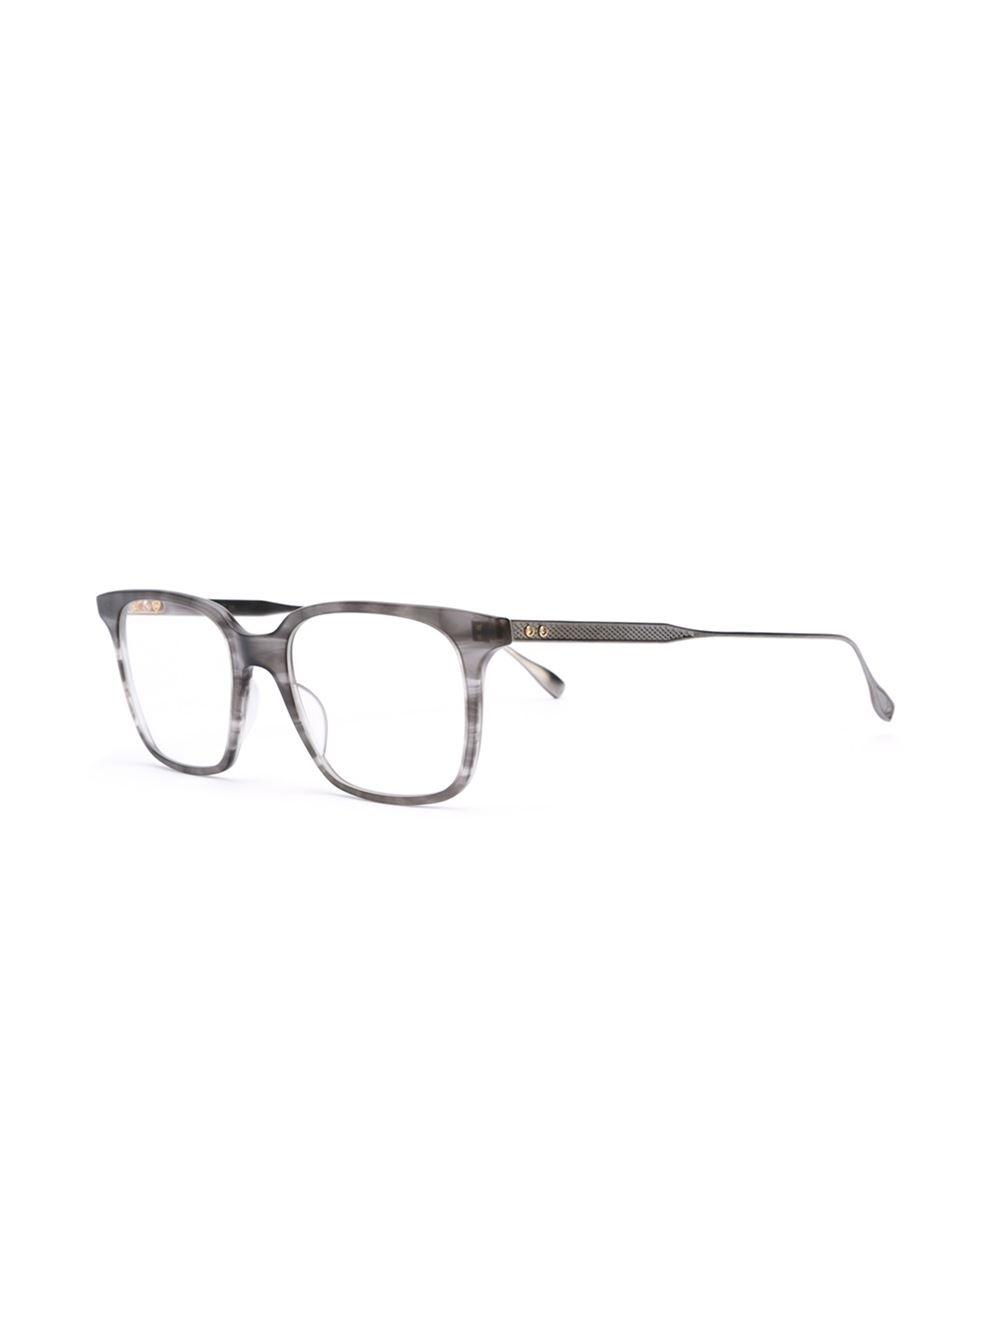 ee5da089fdd4 Lyst - Dita Eyewear  birch  Glasses in Gray